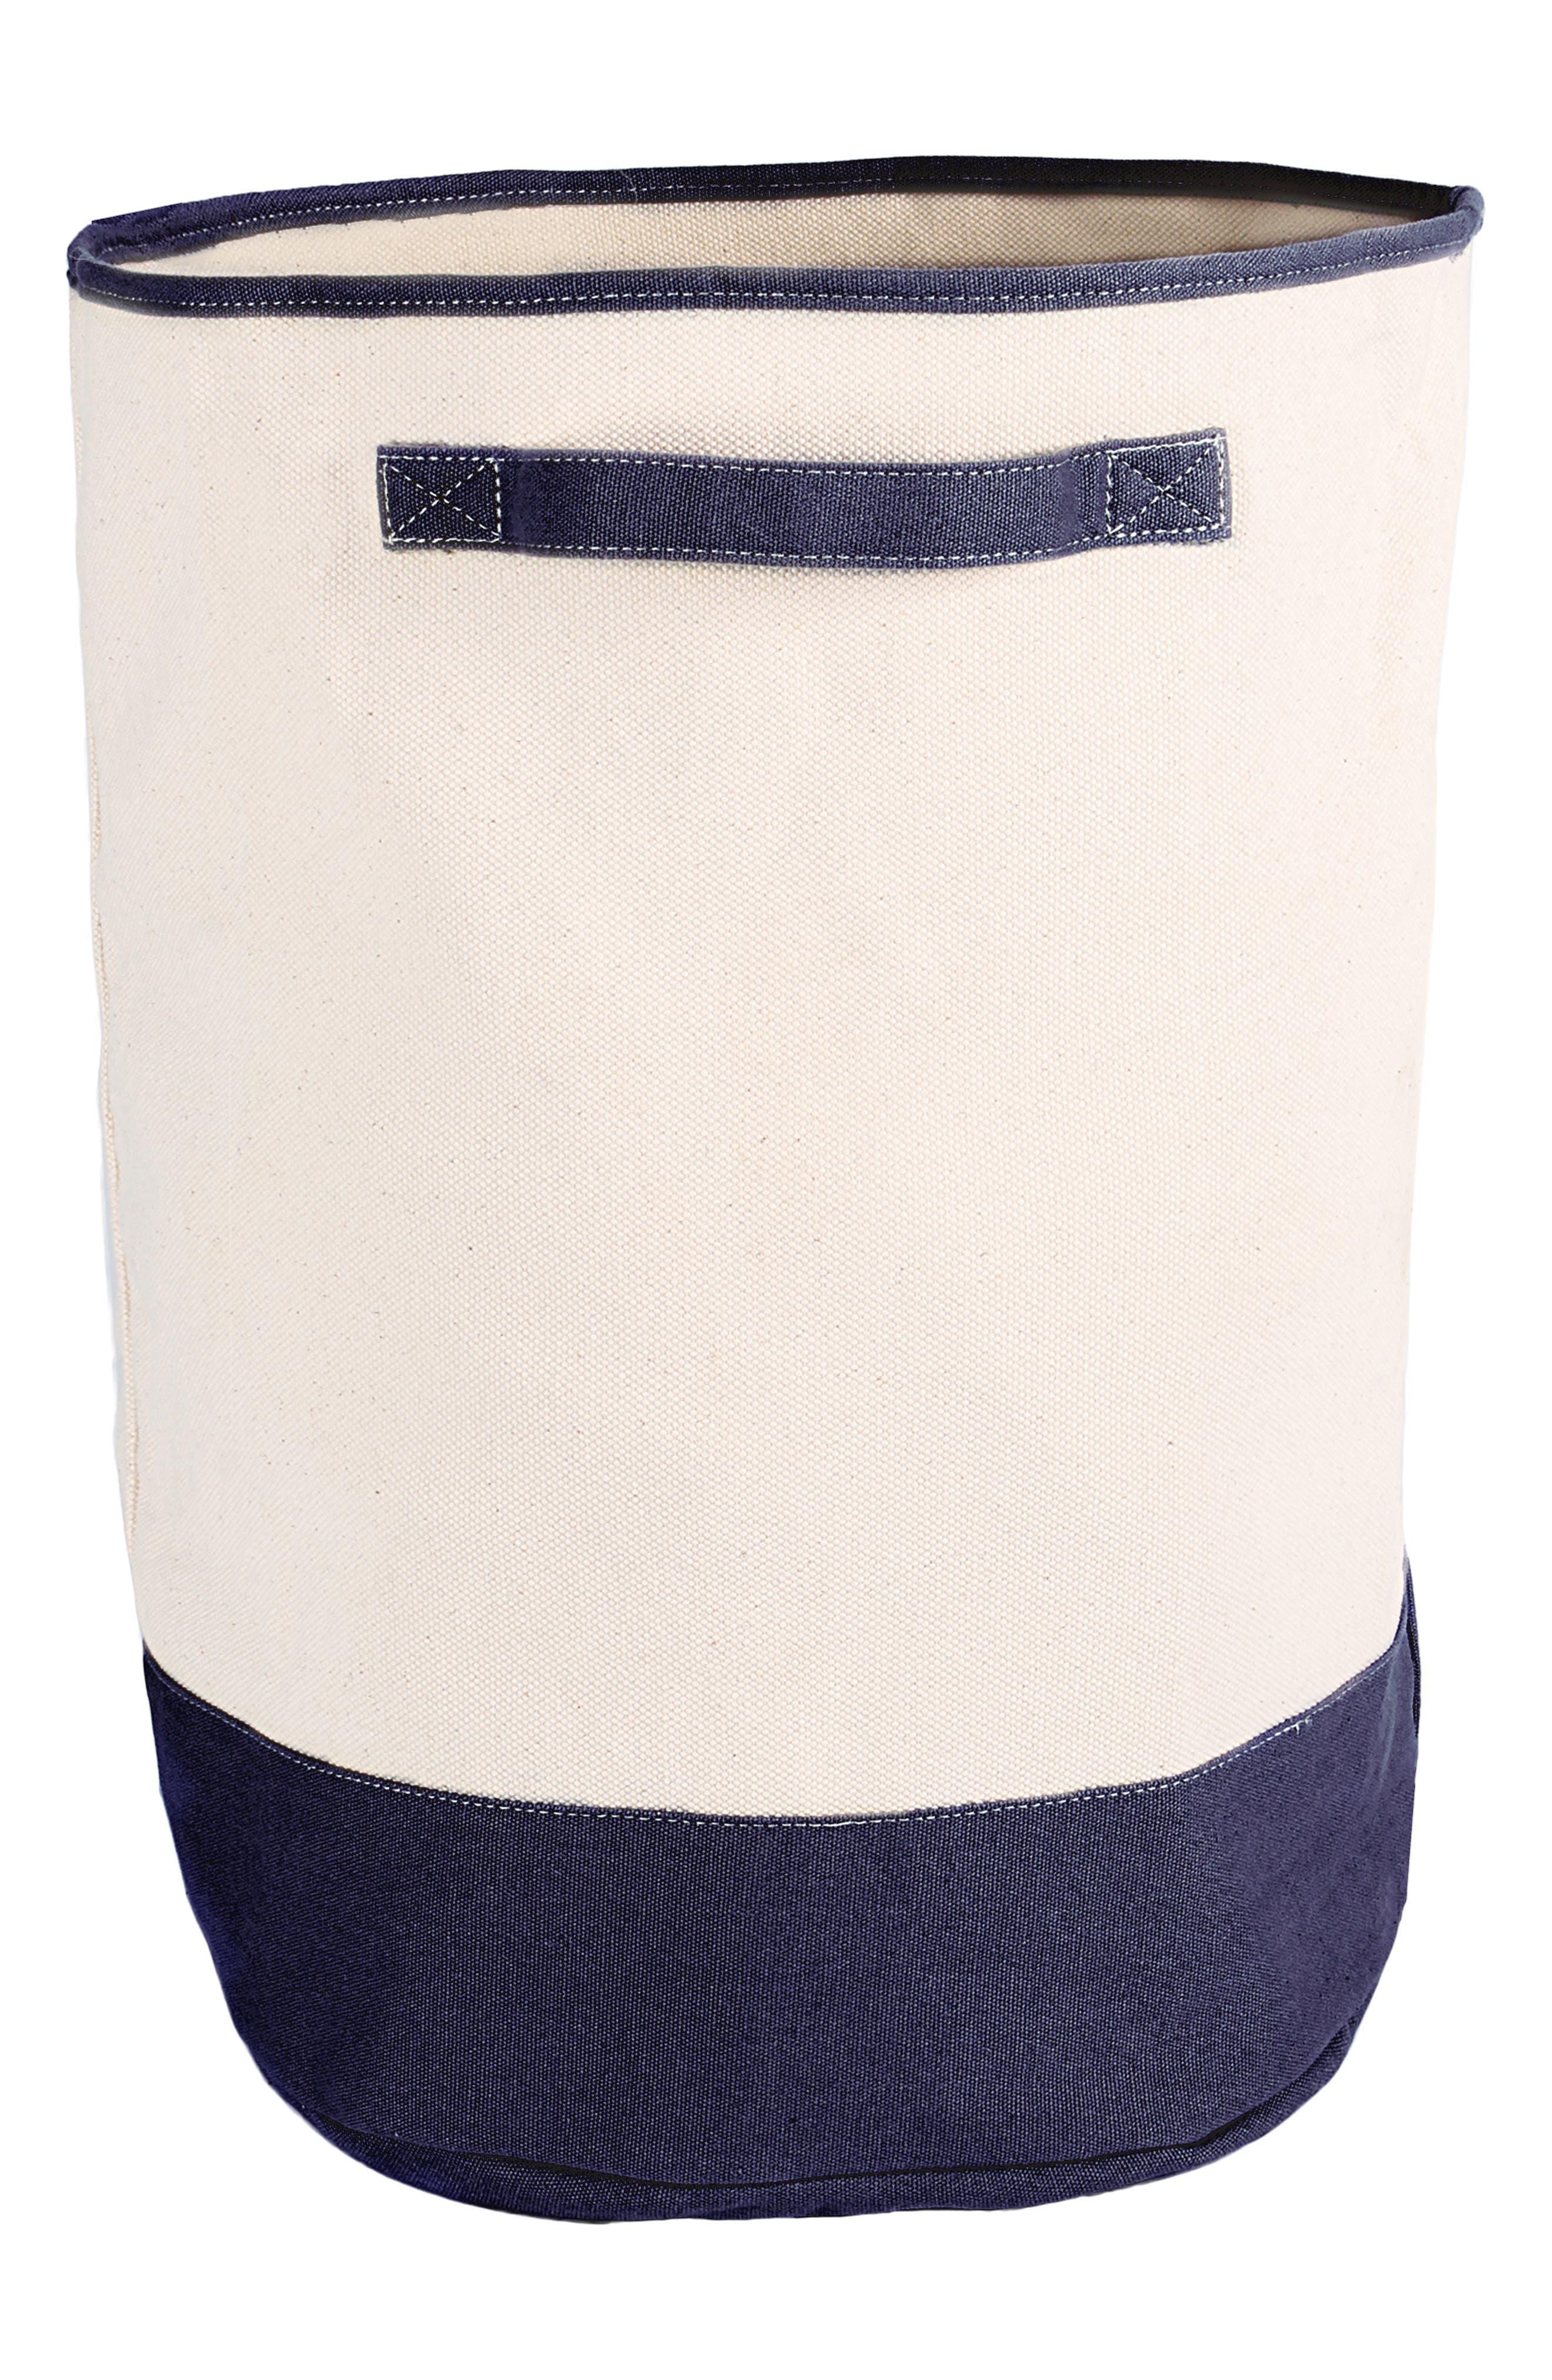 Monogram Round Canvas Hamper,                         Main,                         color, Navy - Blank